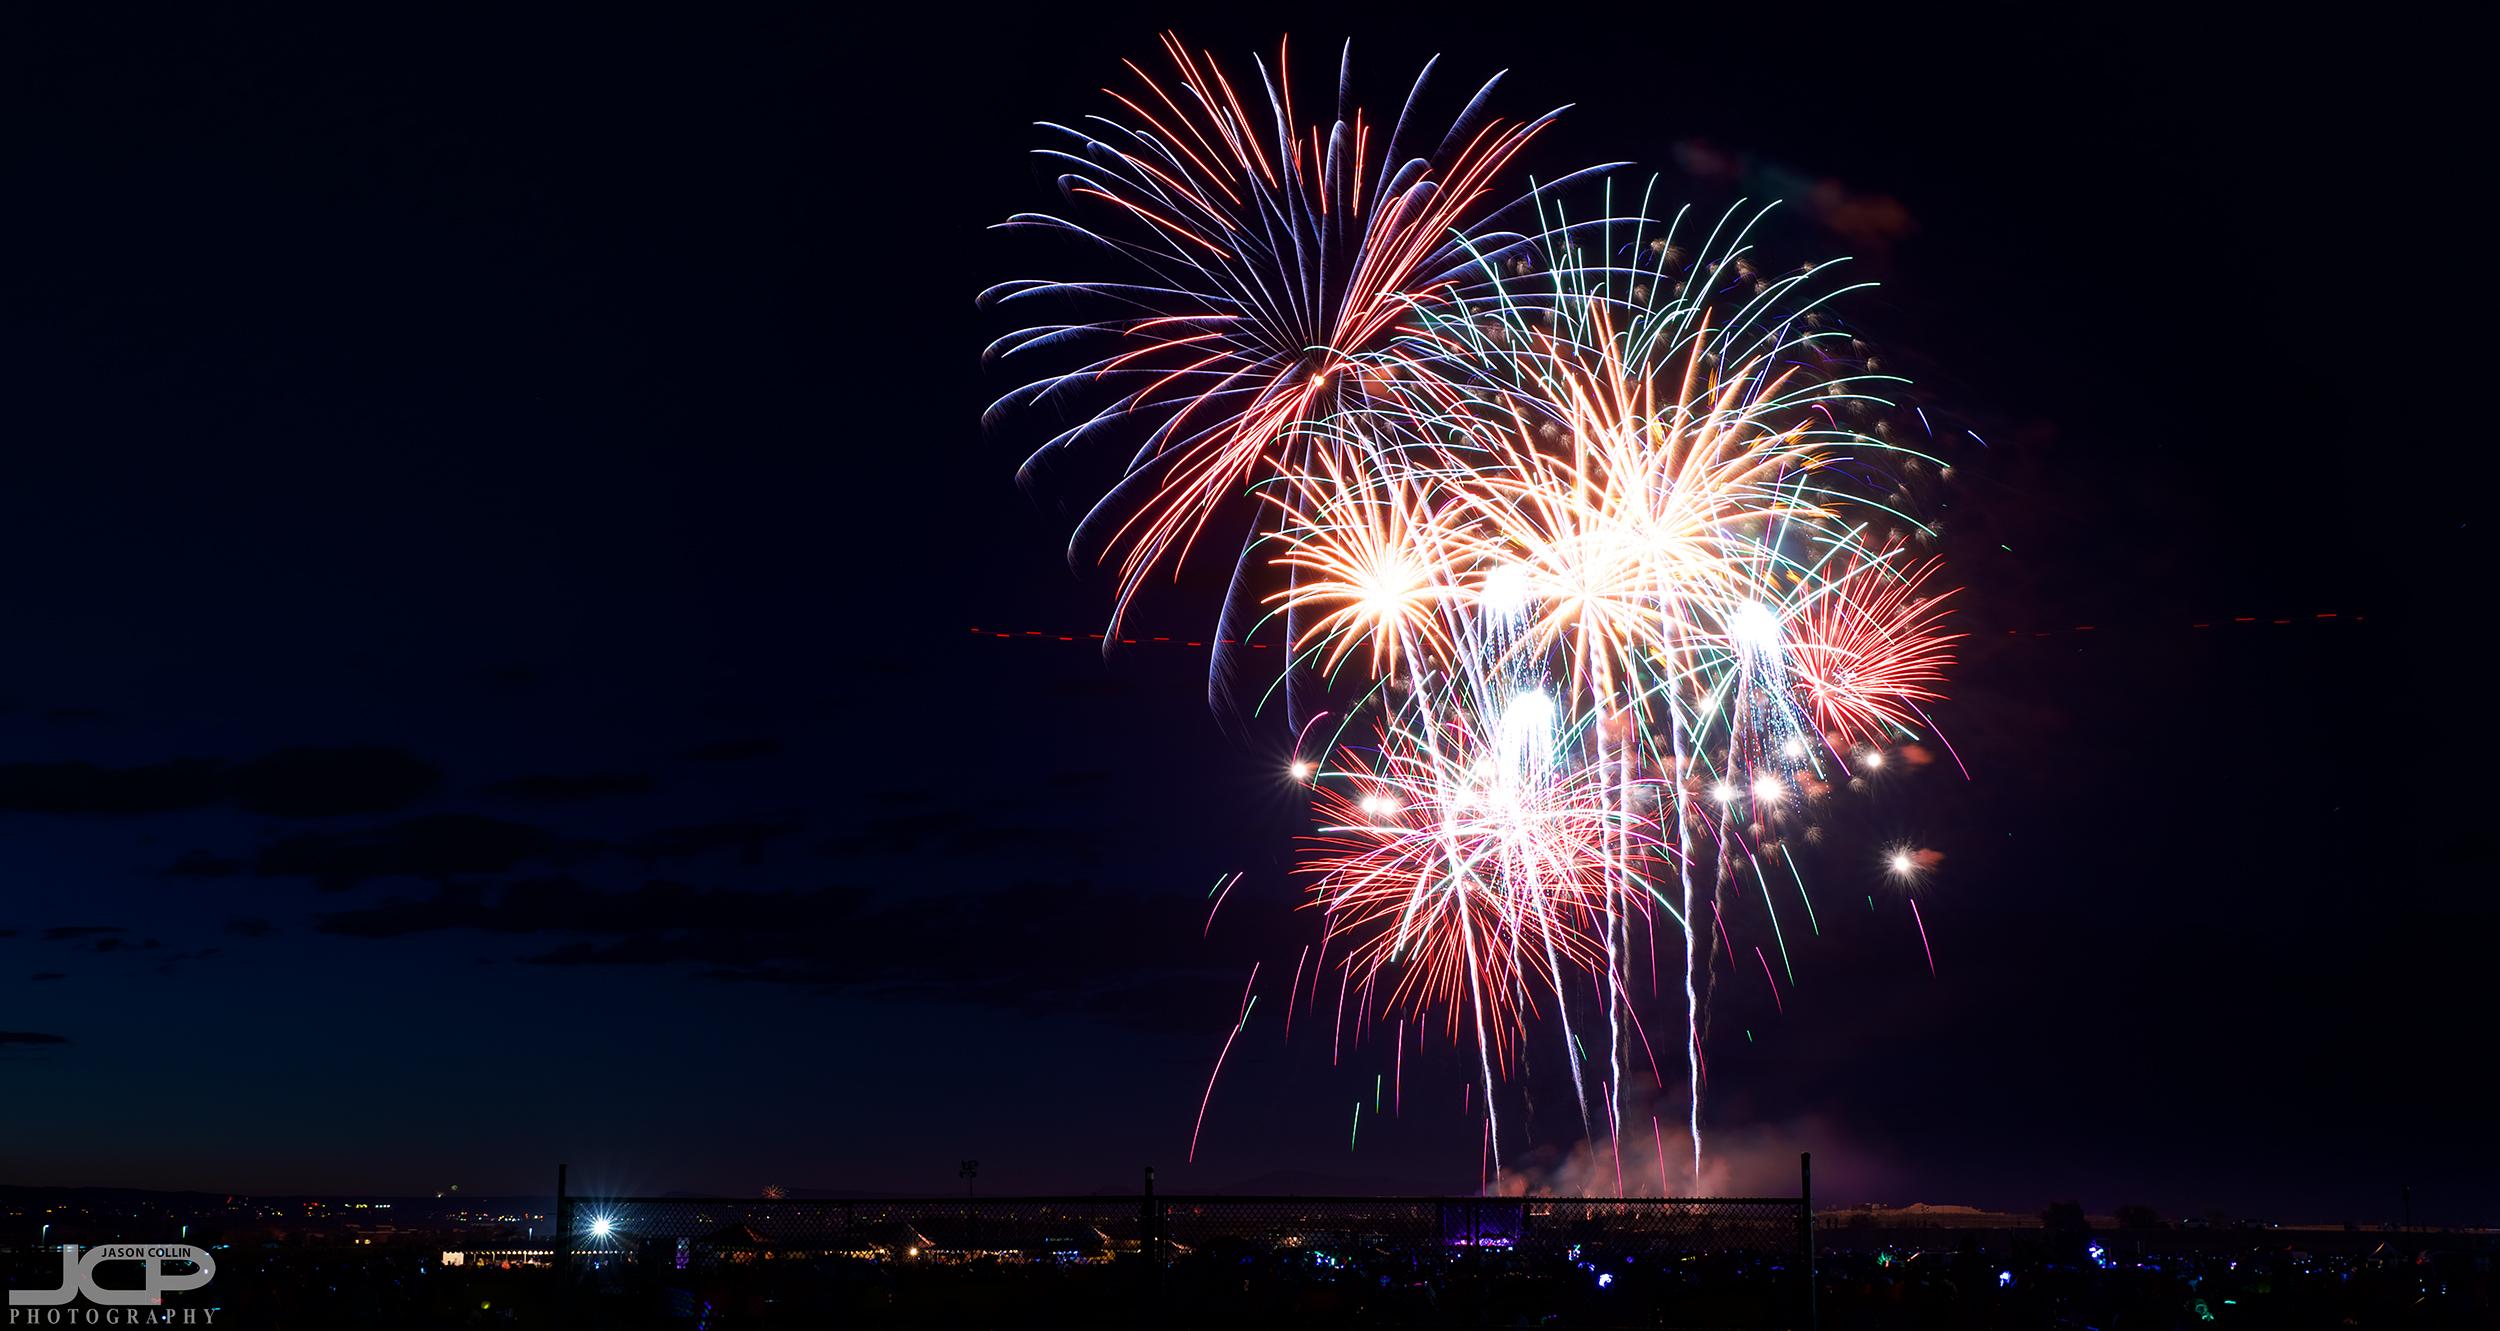 fireworks-7-04-2019-abq-131730.jpg